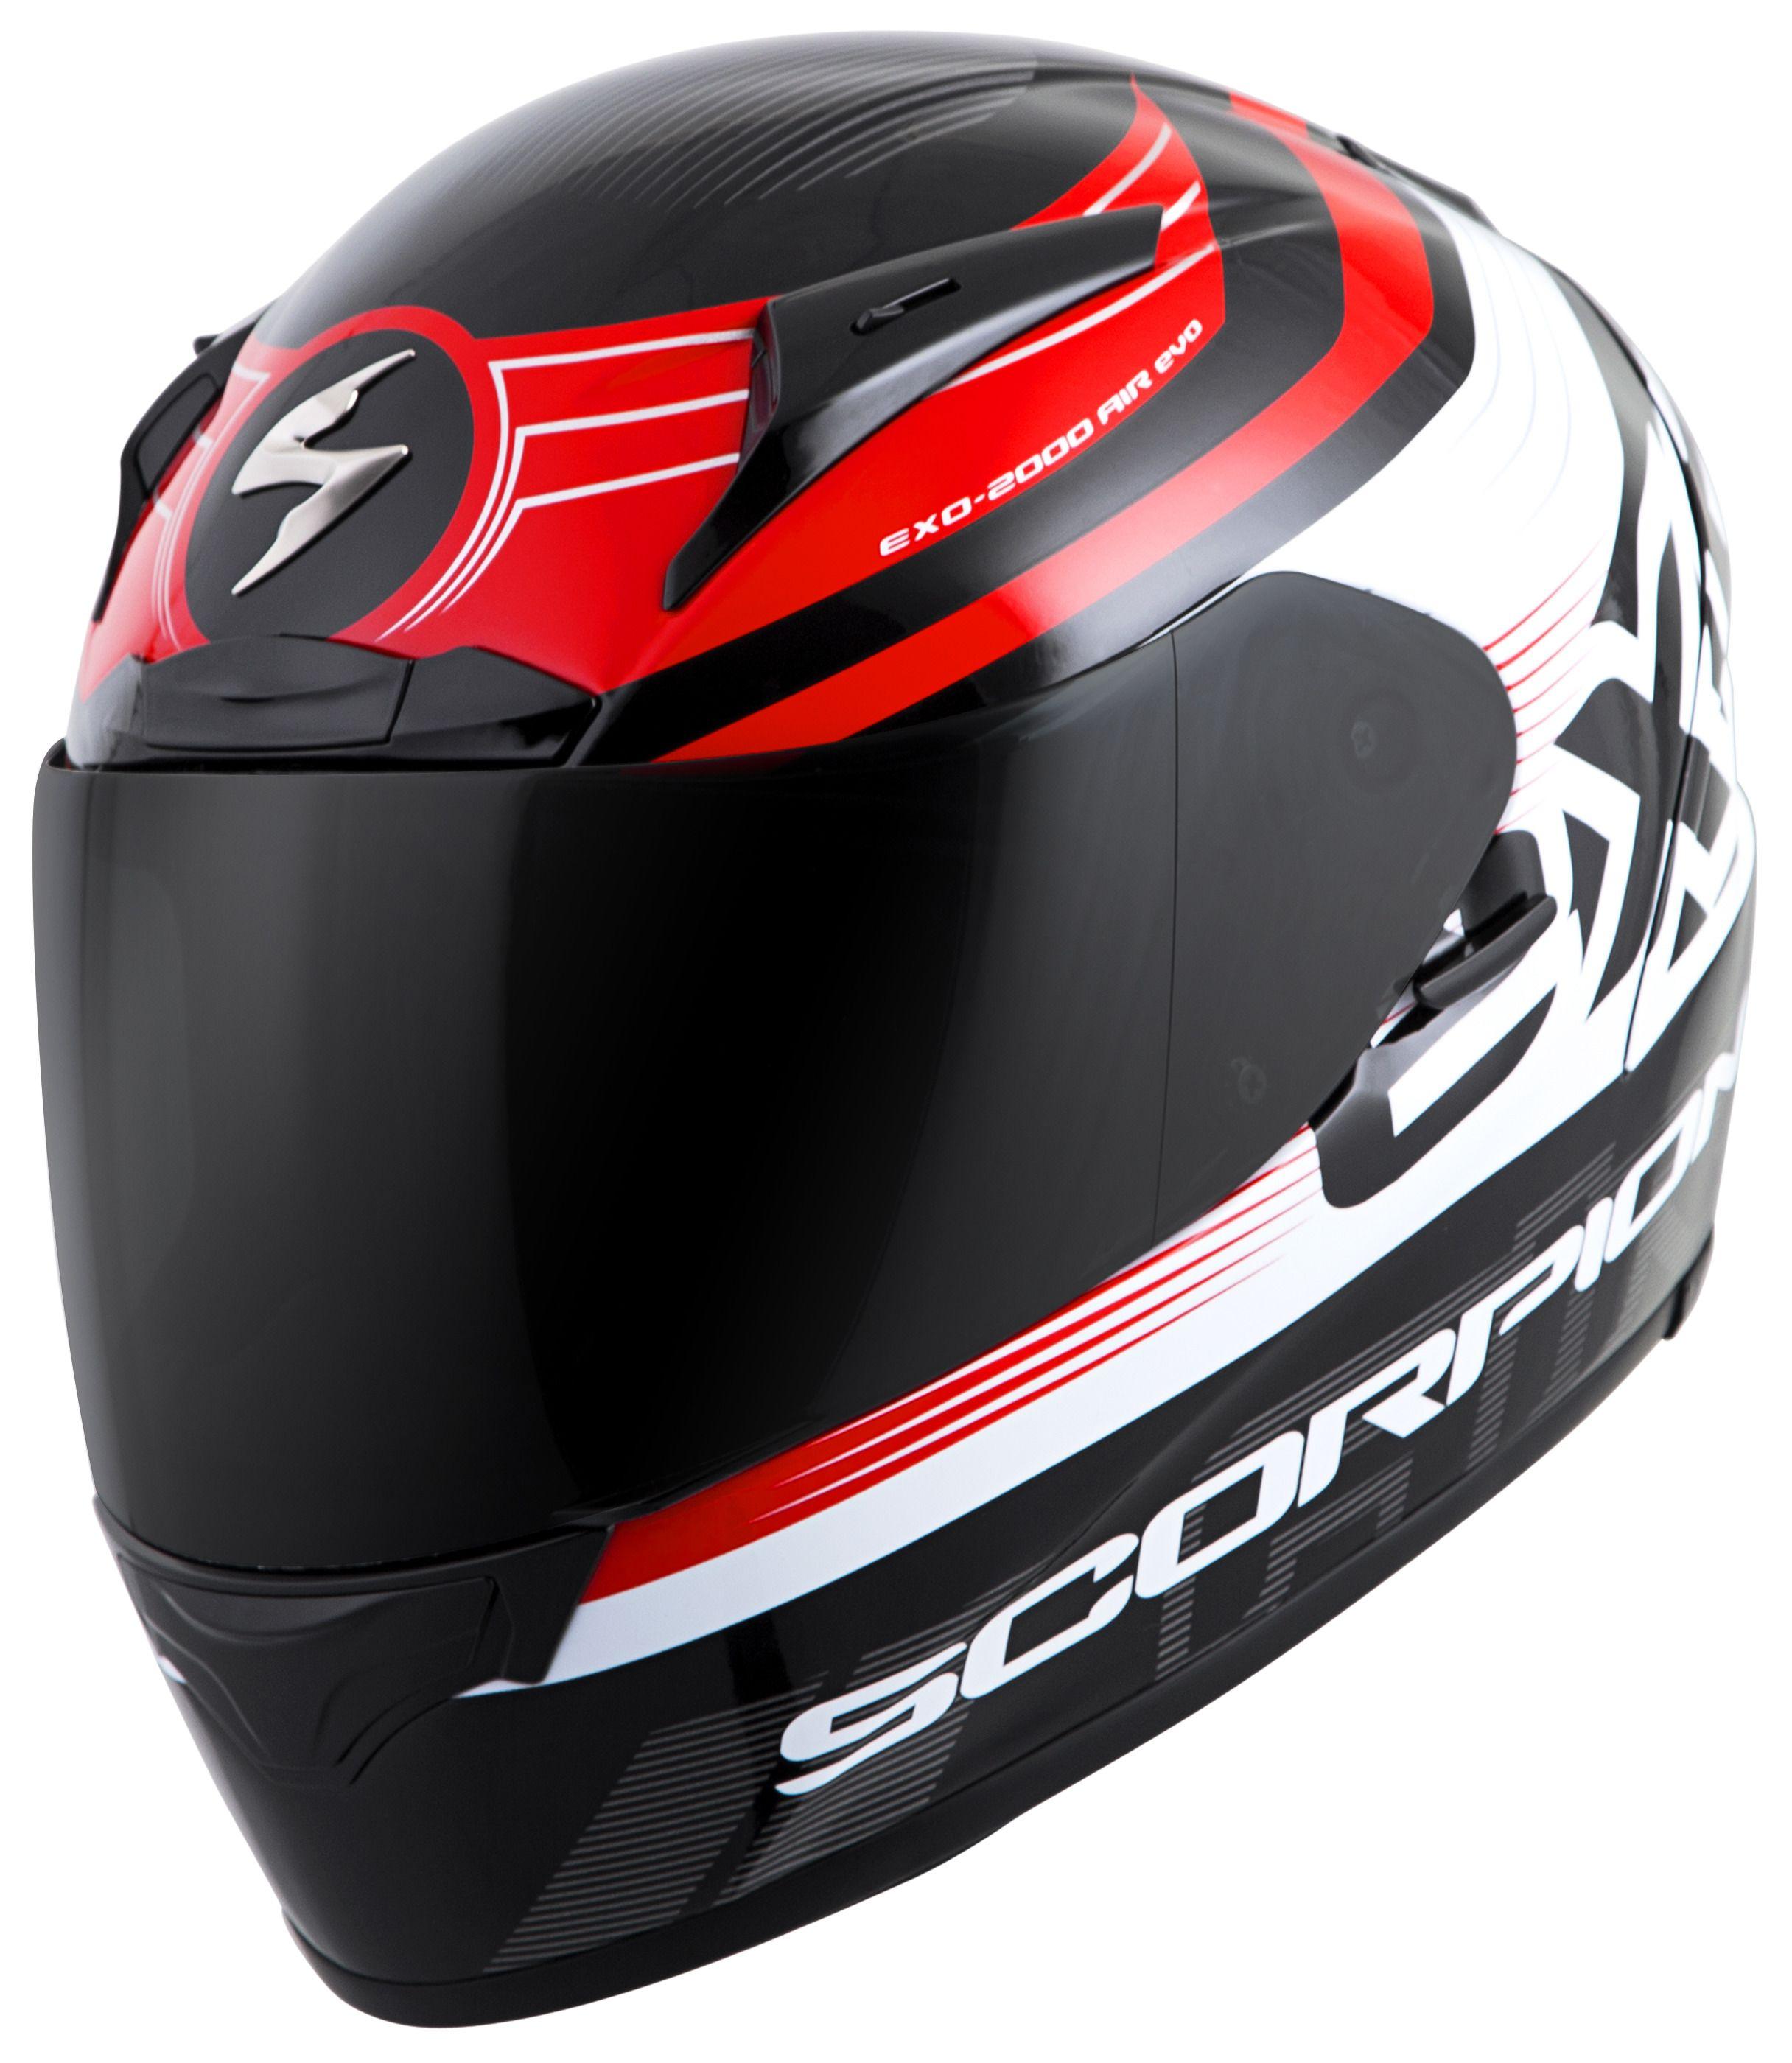 scorpion exo r2000 fortis helmet revzilla. Black Bedroom Furniture Sets. Home Design Ideas